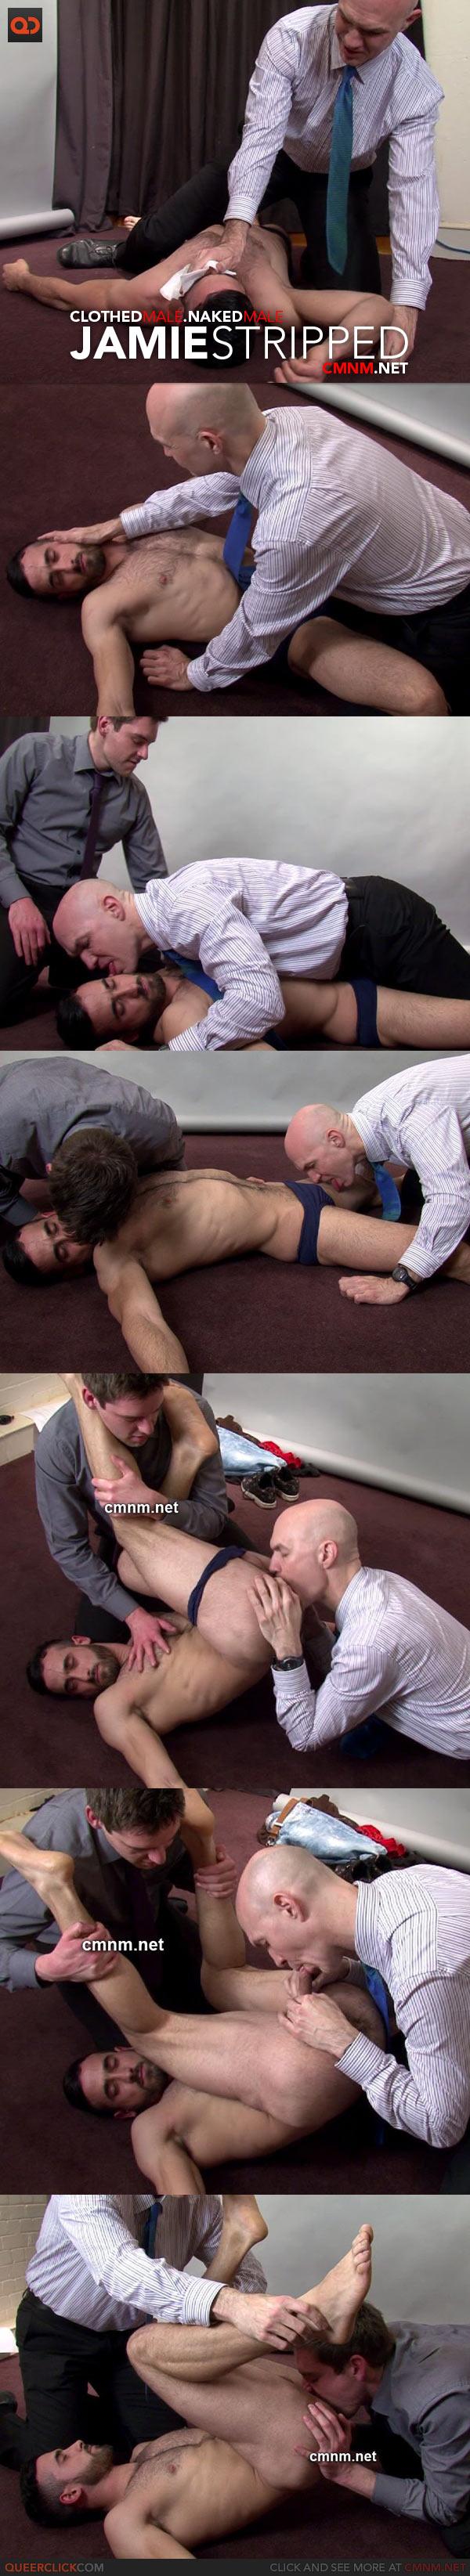 Threesome sex comics